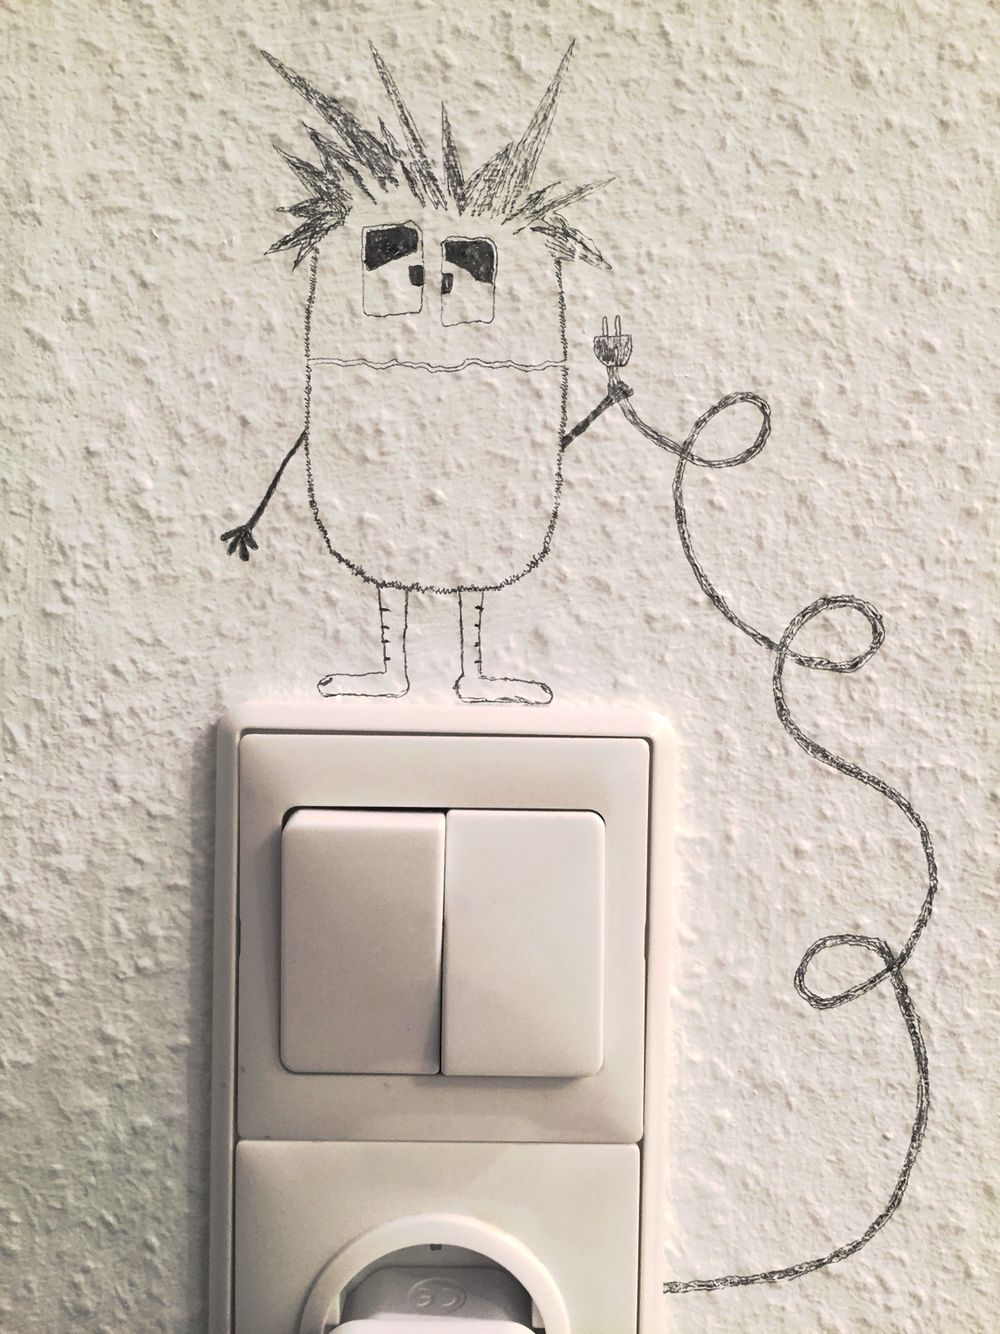 Hacoly Wandschalter Wandsticker Steckdose Wandtattoo Komisch Angst Cat Lichtschalter Wandaufkleber Kunst Wand Aufkleber Dekoration Wandtattoo Wandsticker